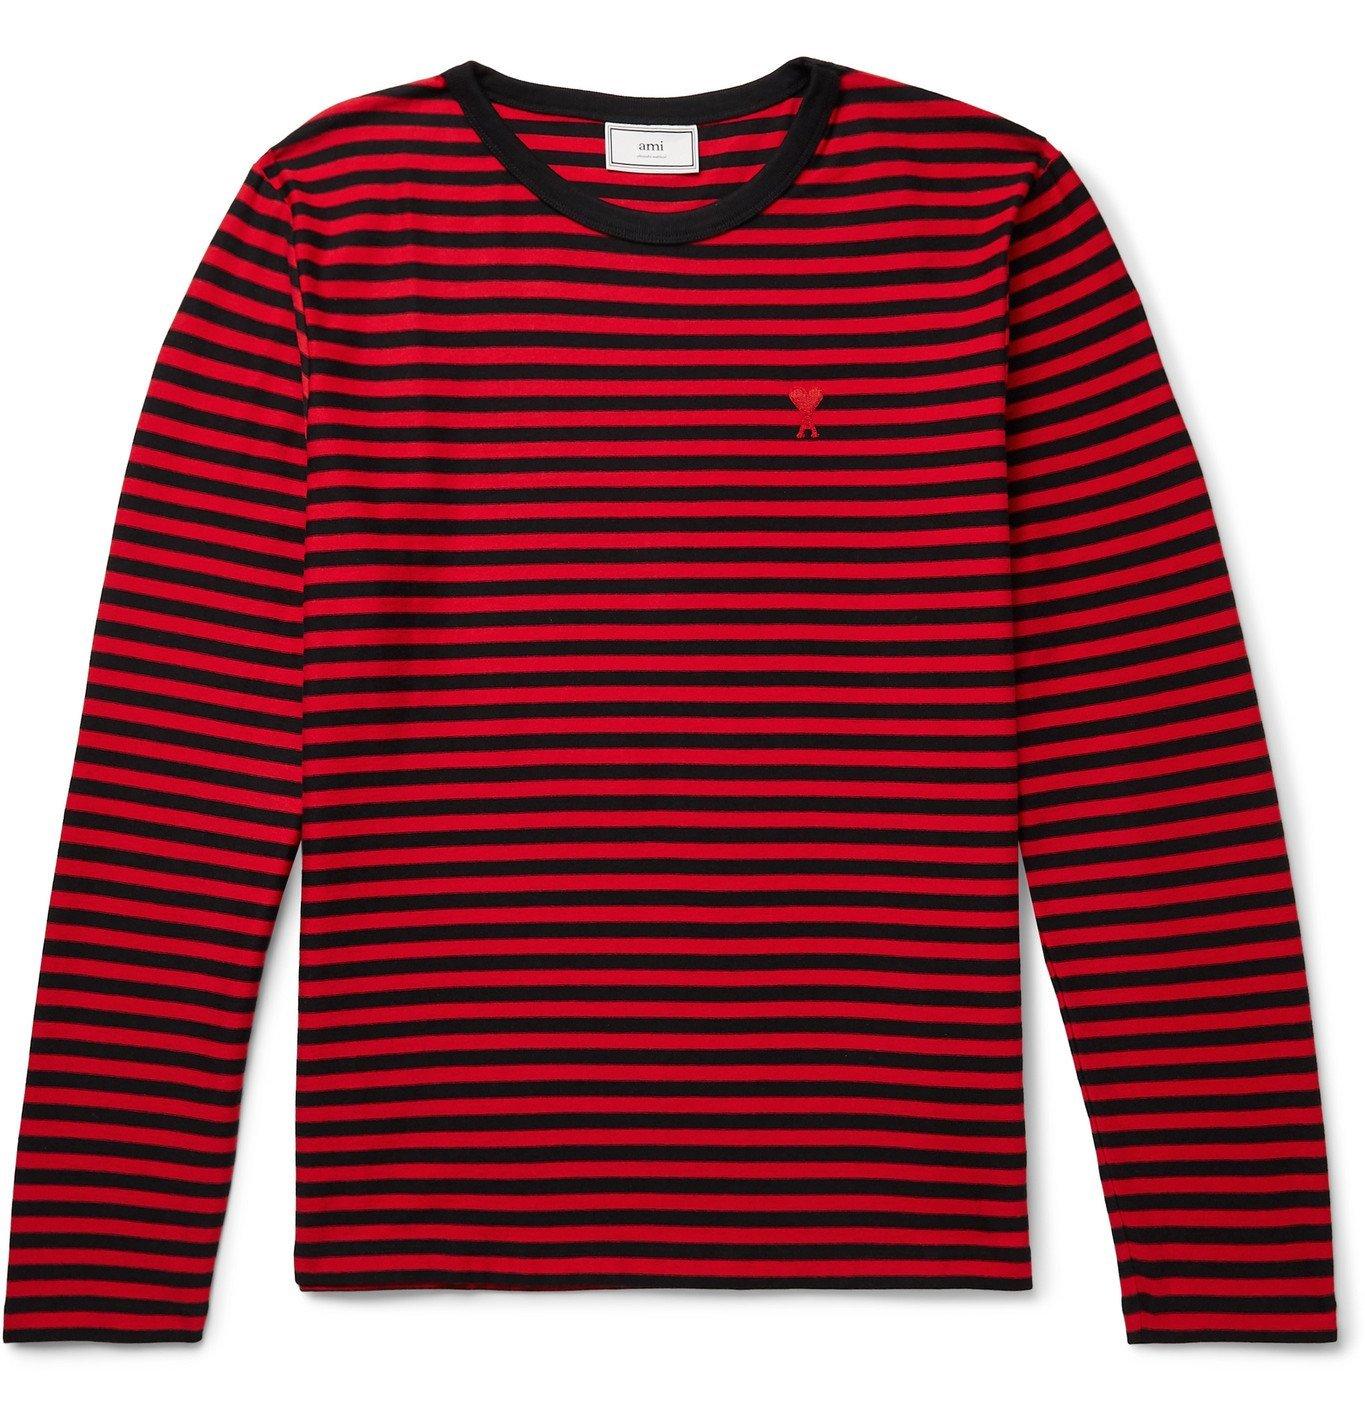 Photo: AMI - Logo-Appliquéd Striped Cotton-Jersey T-Shirt - Red